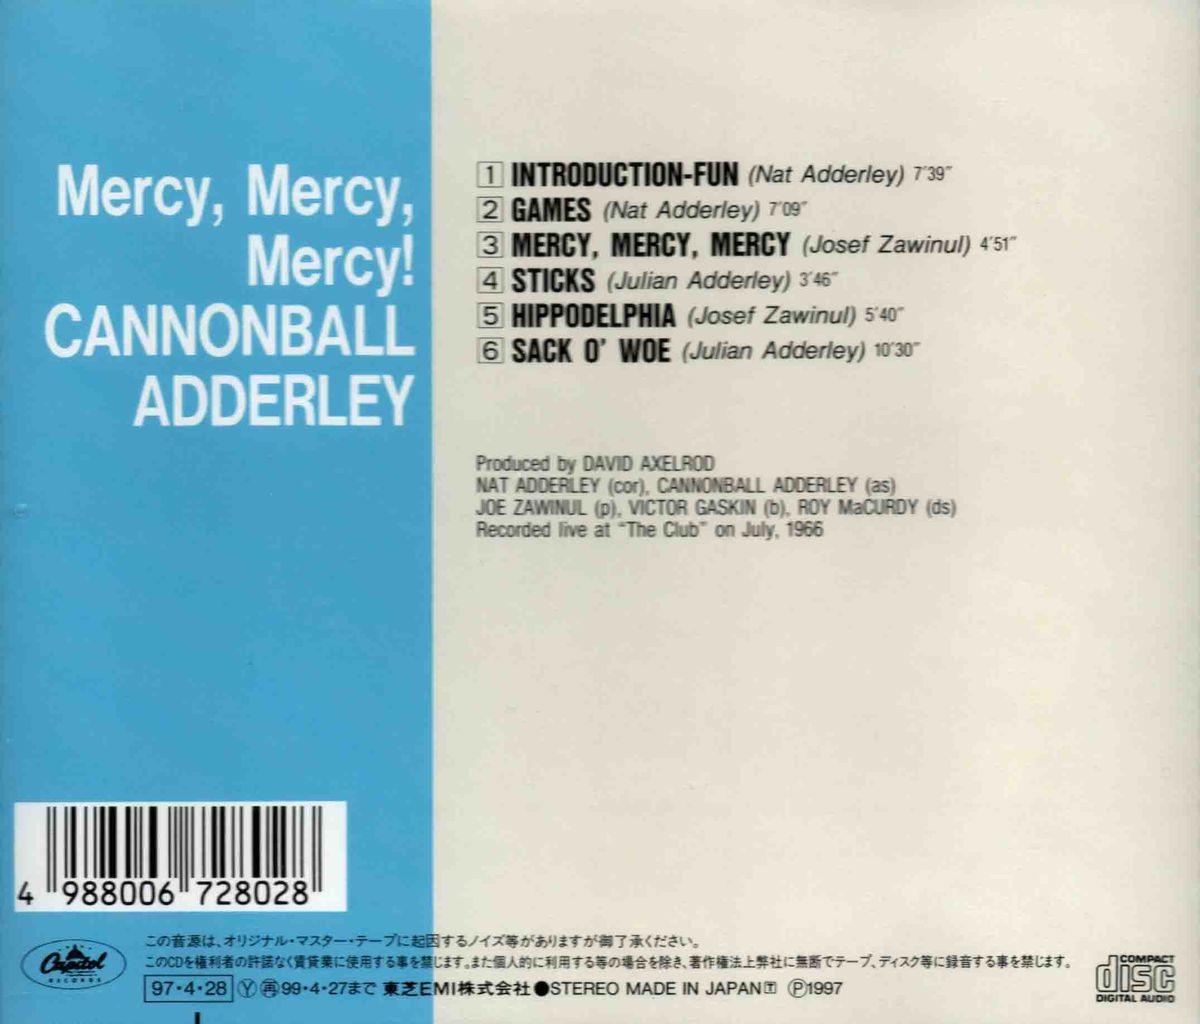 MERCY, MERCY, MERCY!-2